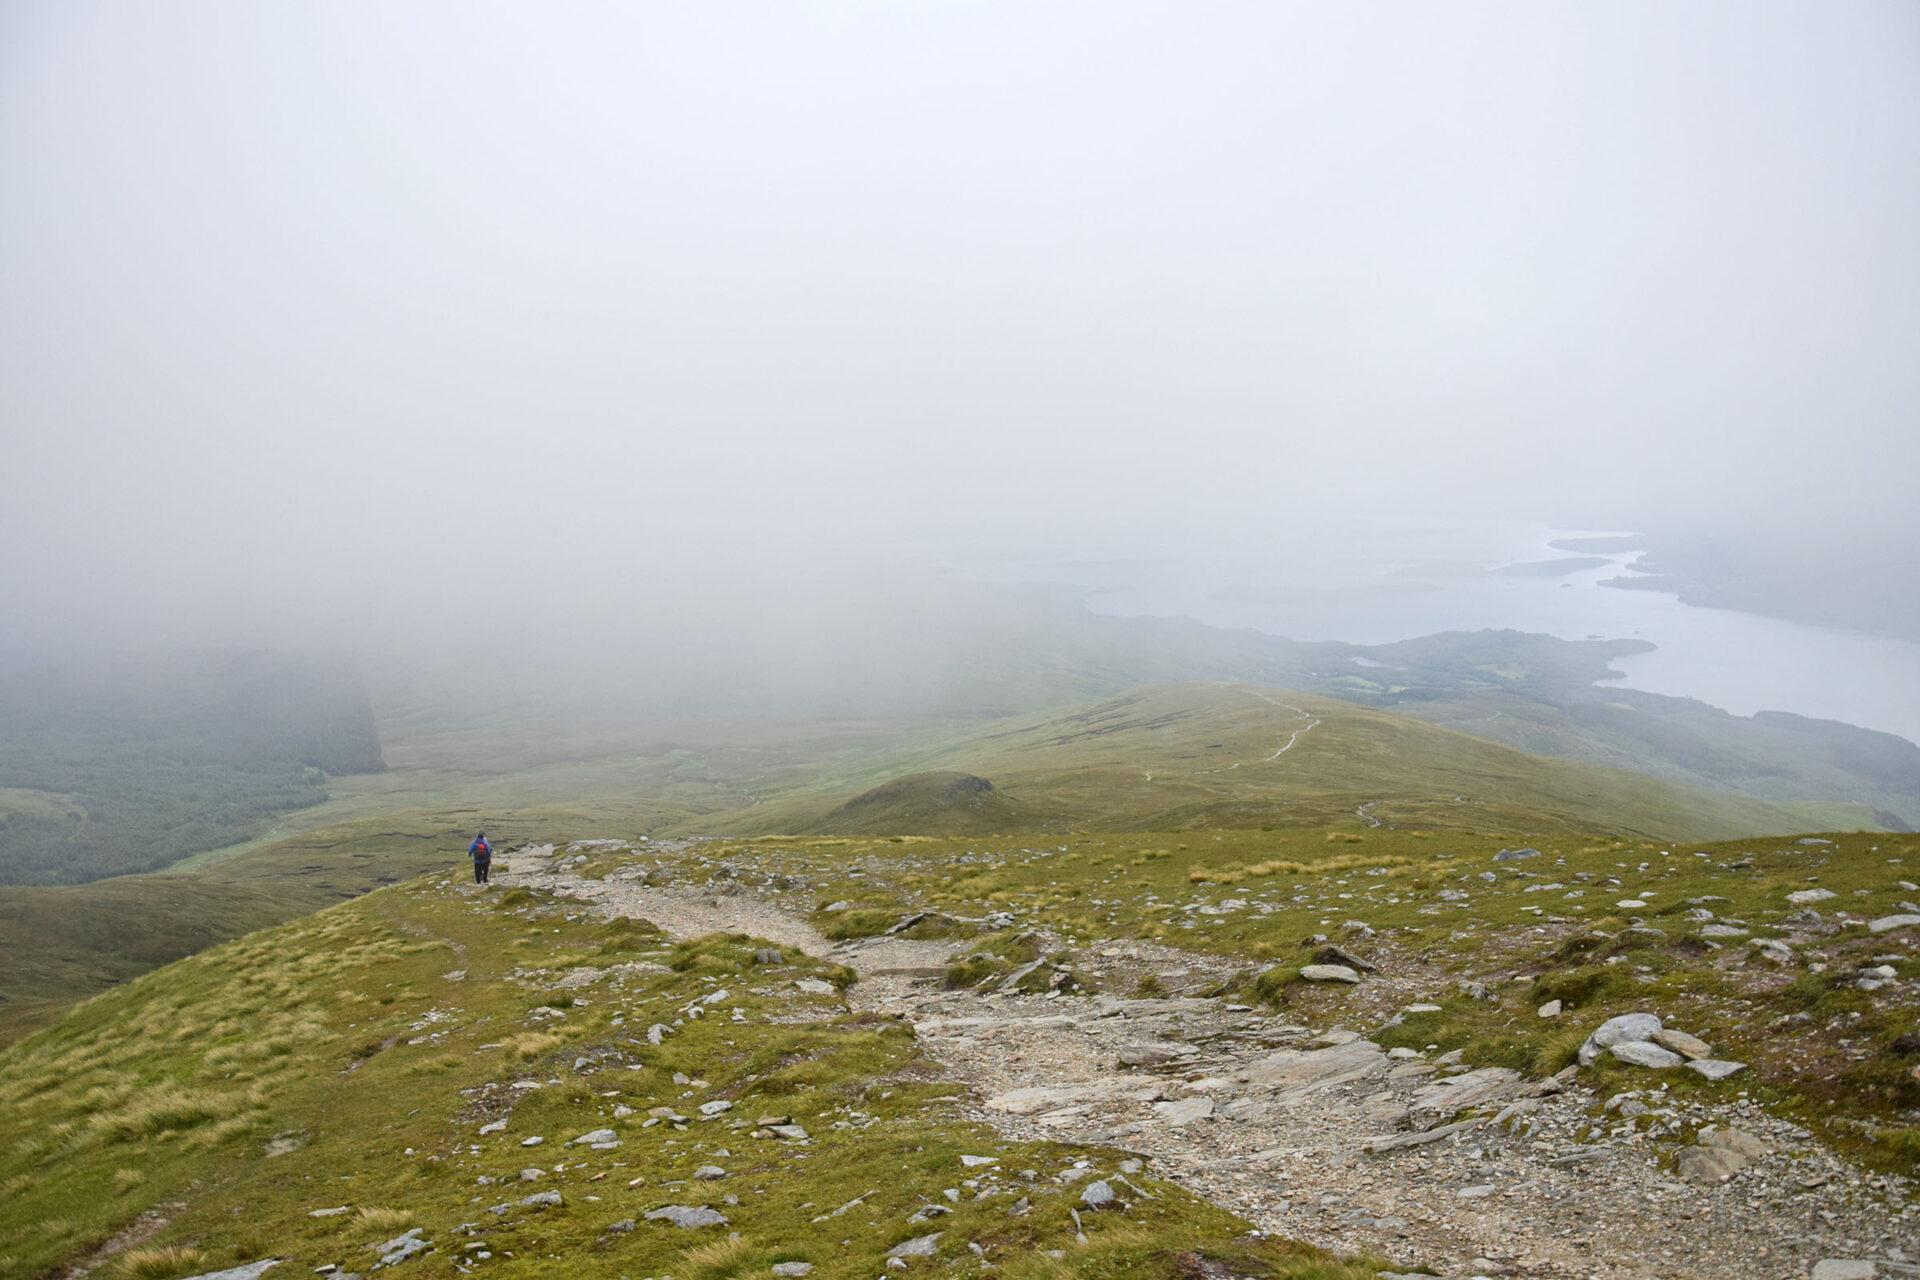 17 Nochmal Nebel beim Rueckweg